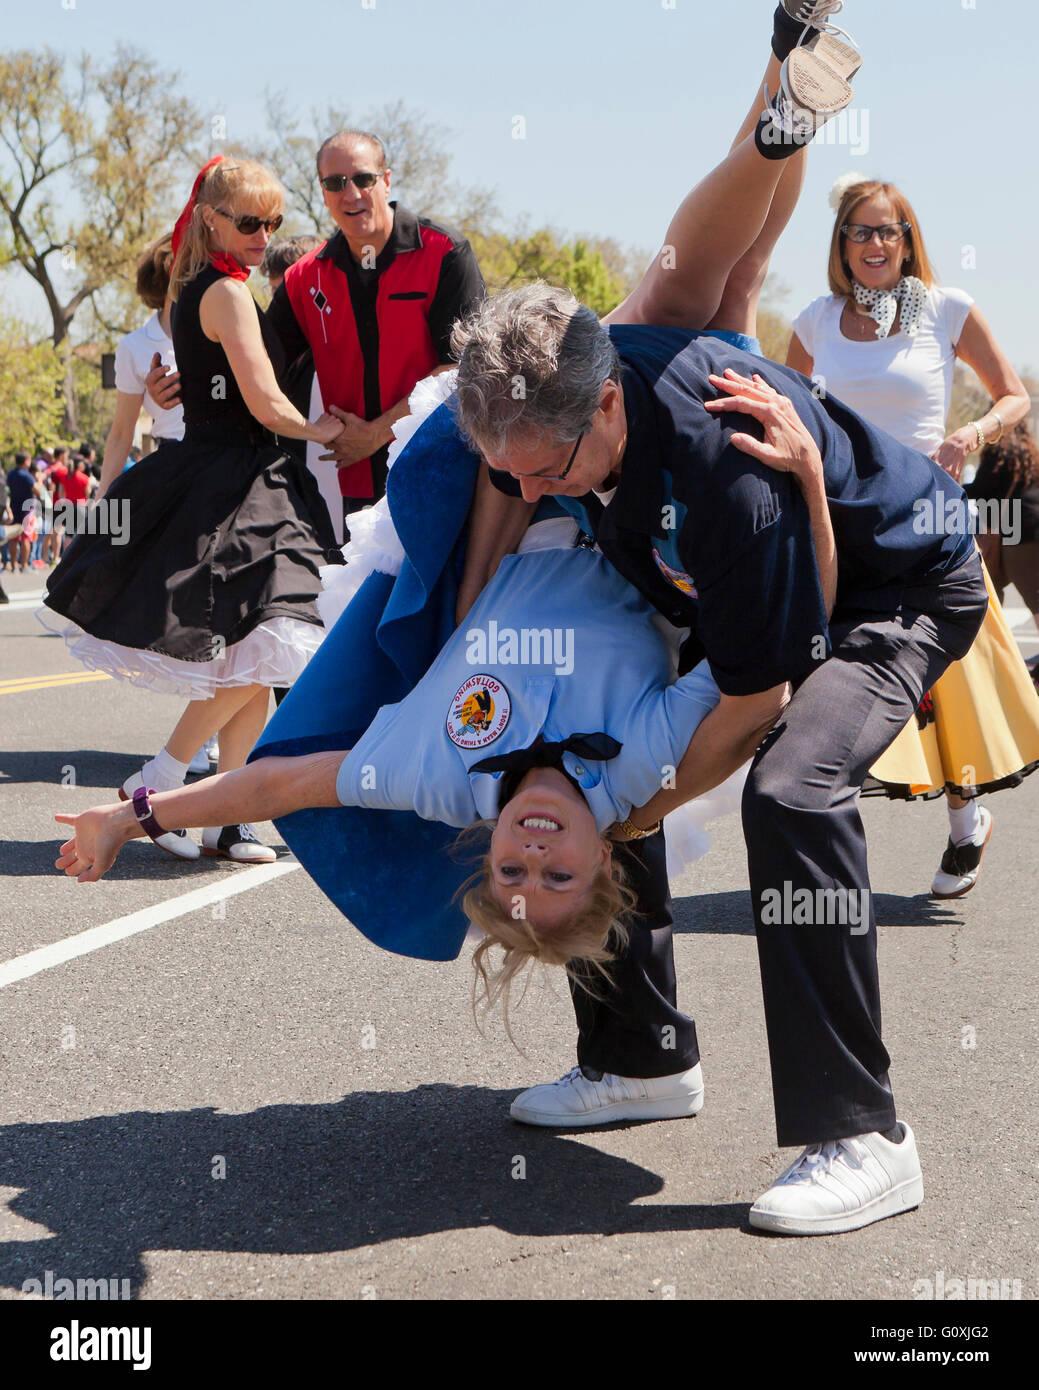 50er Jahre swing Tanz Darsteller bei einem Outdoor-Kulturfestival - USA Stockbild